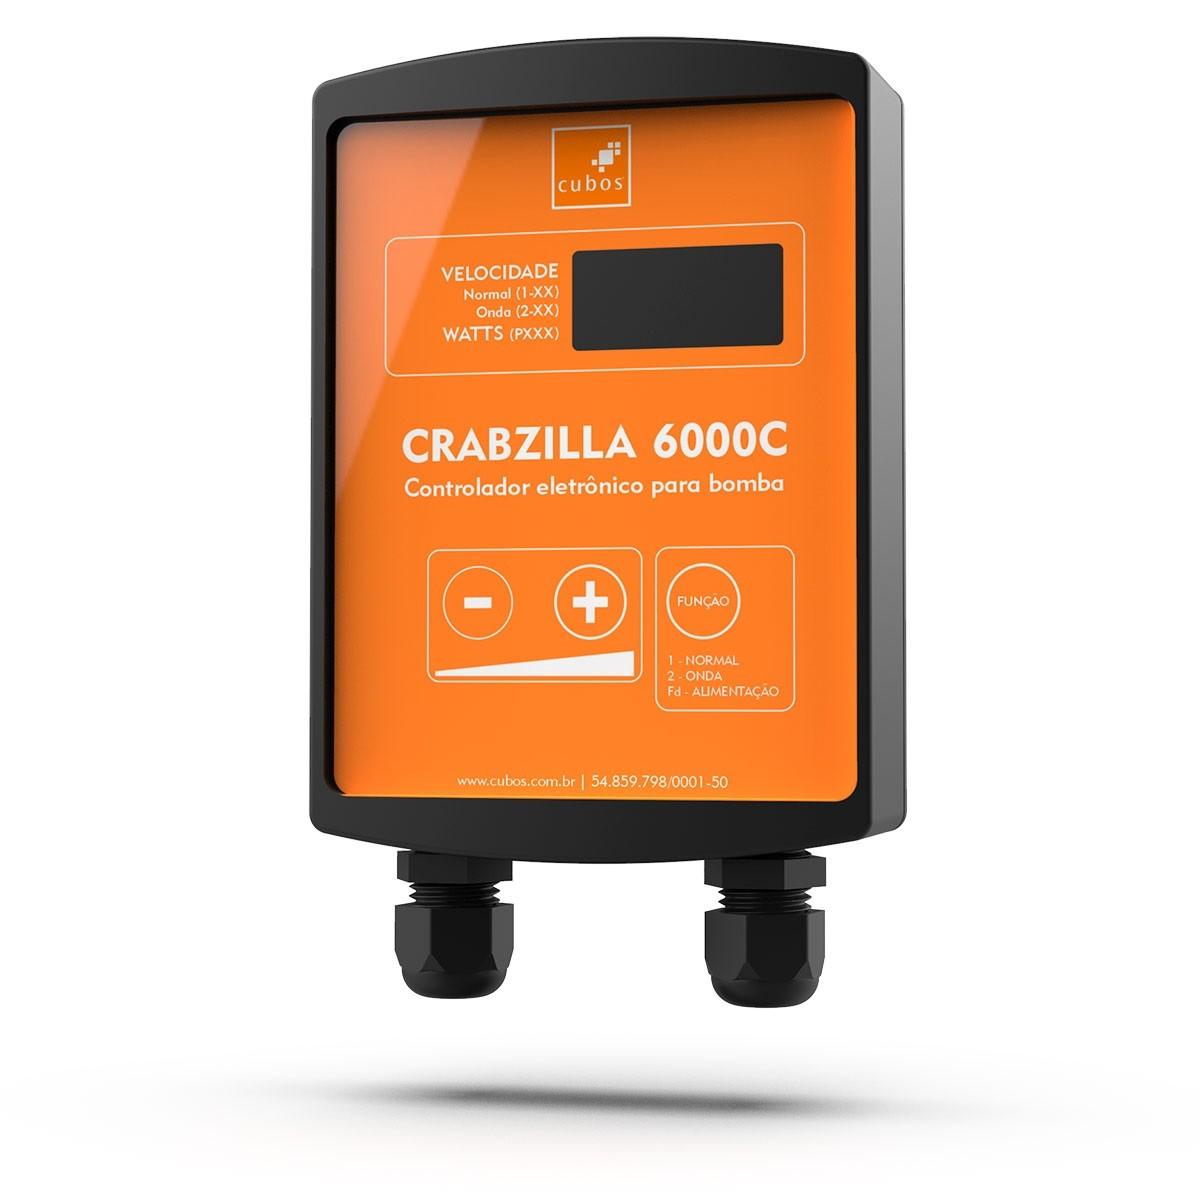 Bomba Crabzilla 6000C Cubos - Com Controlador para Lagos